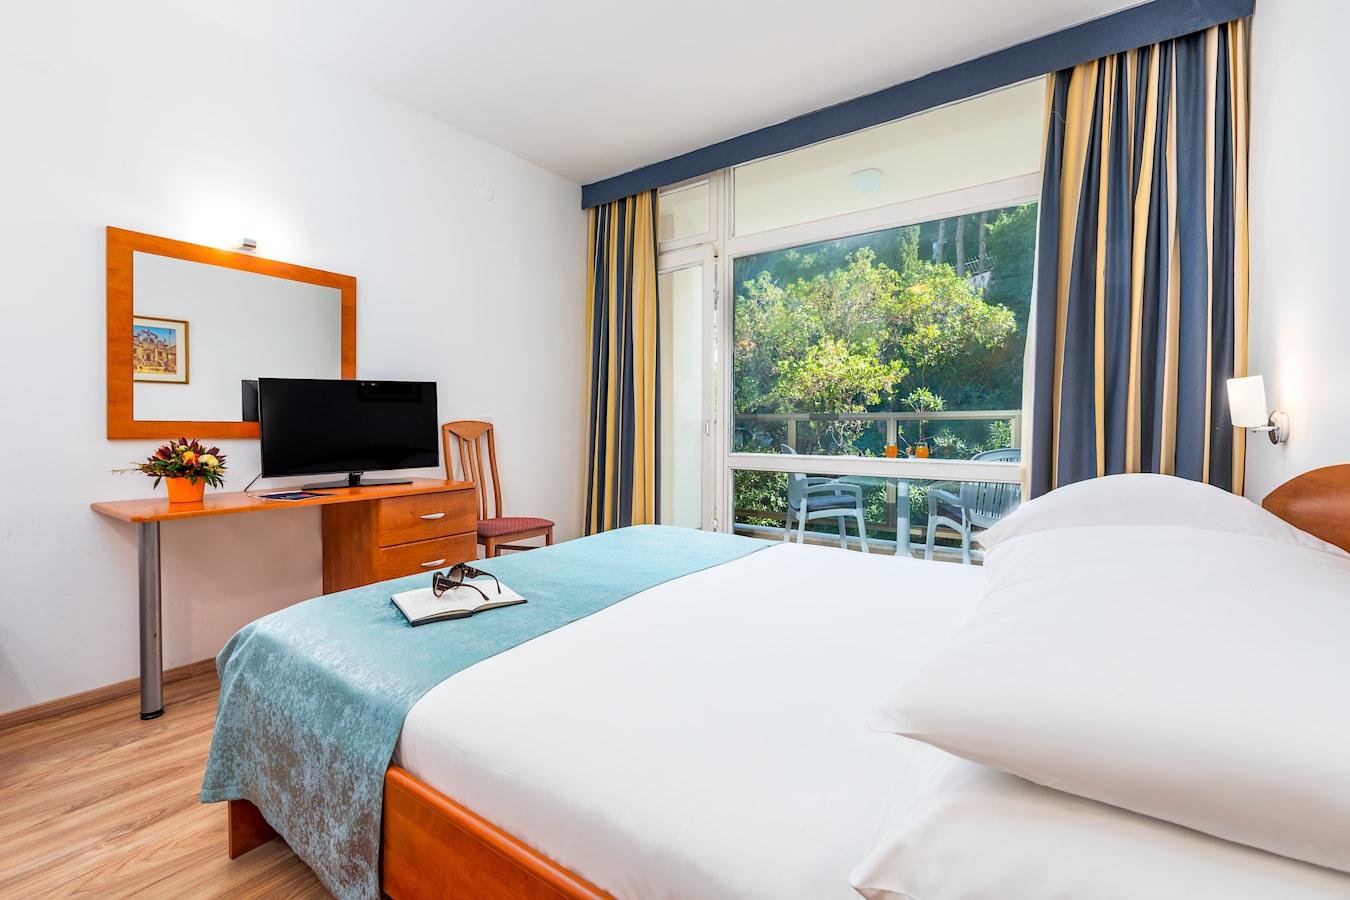 vis-hotel-dubrovnik-double-room-park-view-balcony.jpg